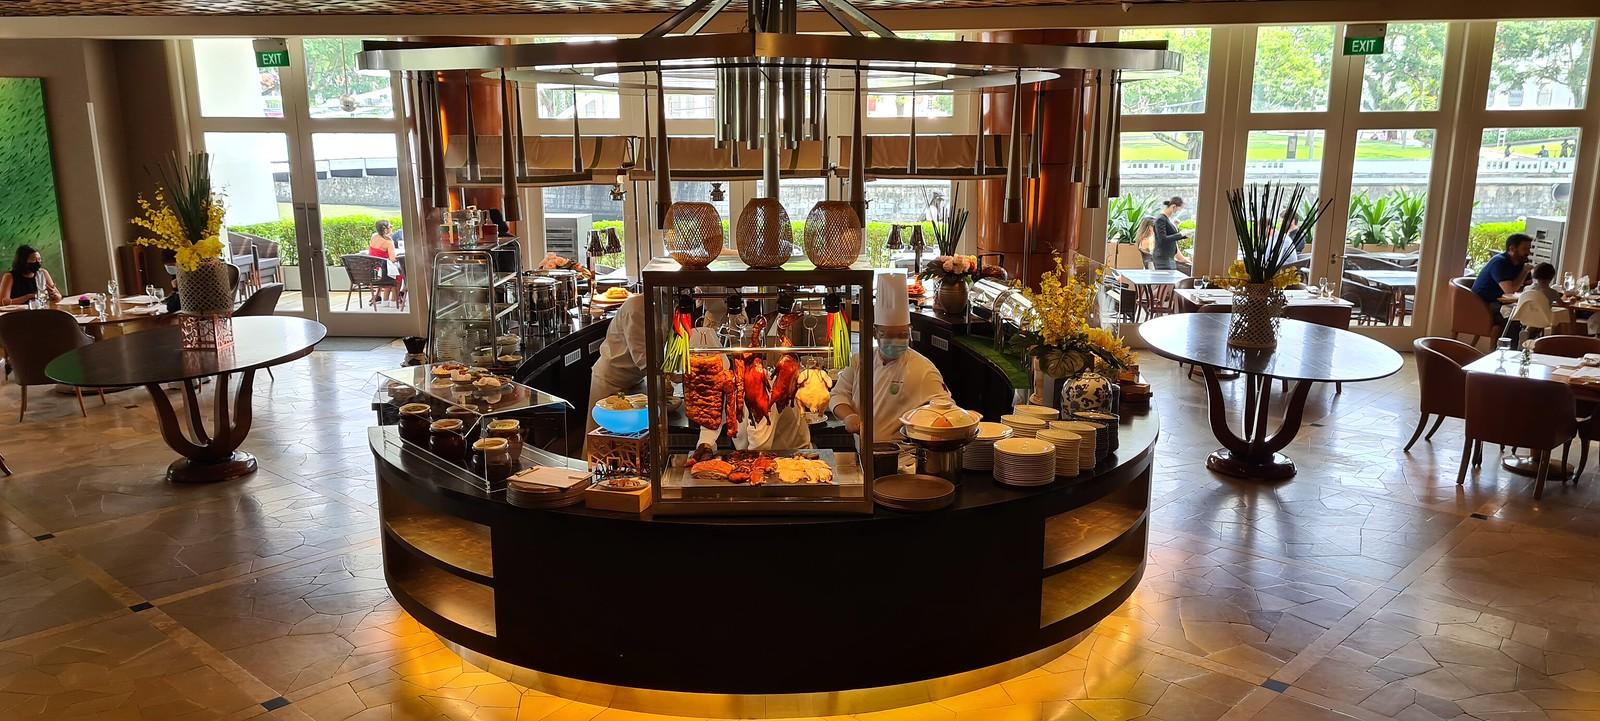 TownRestaurant2